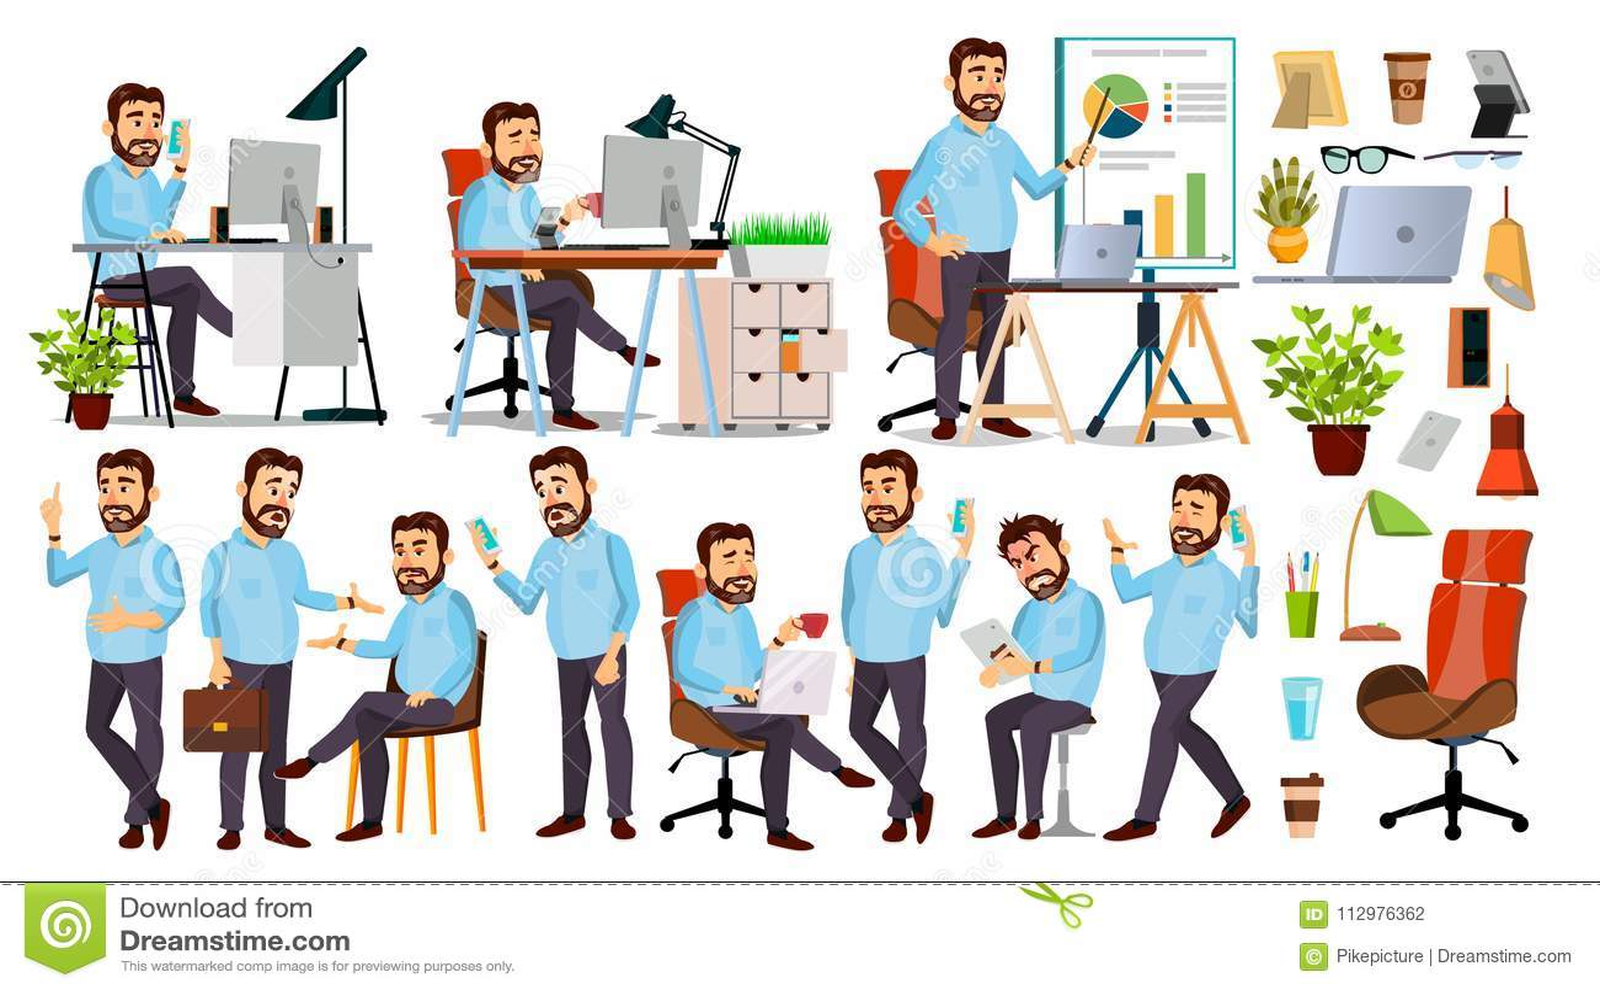 Boss Character Vector. CEO, Managing Director, Representative Director. Poses, Emotions. Boss Meeting. Cartoon Business